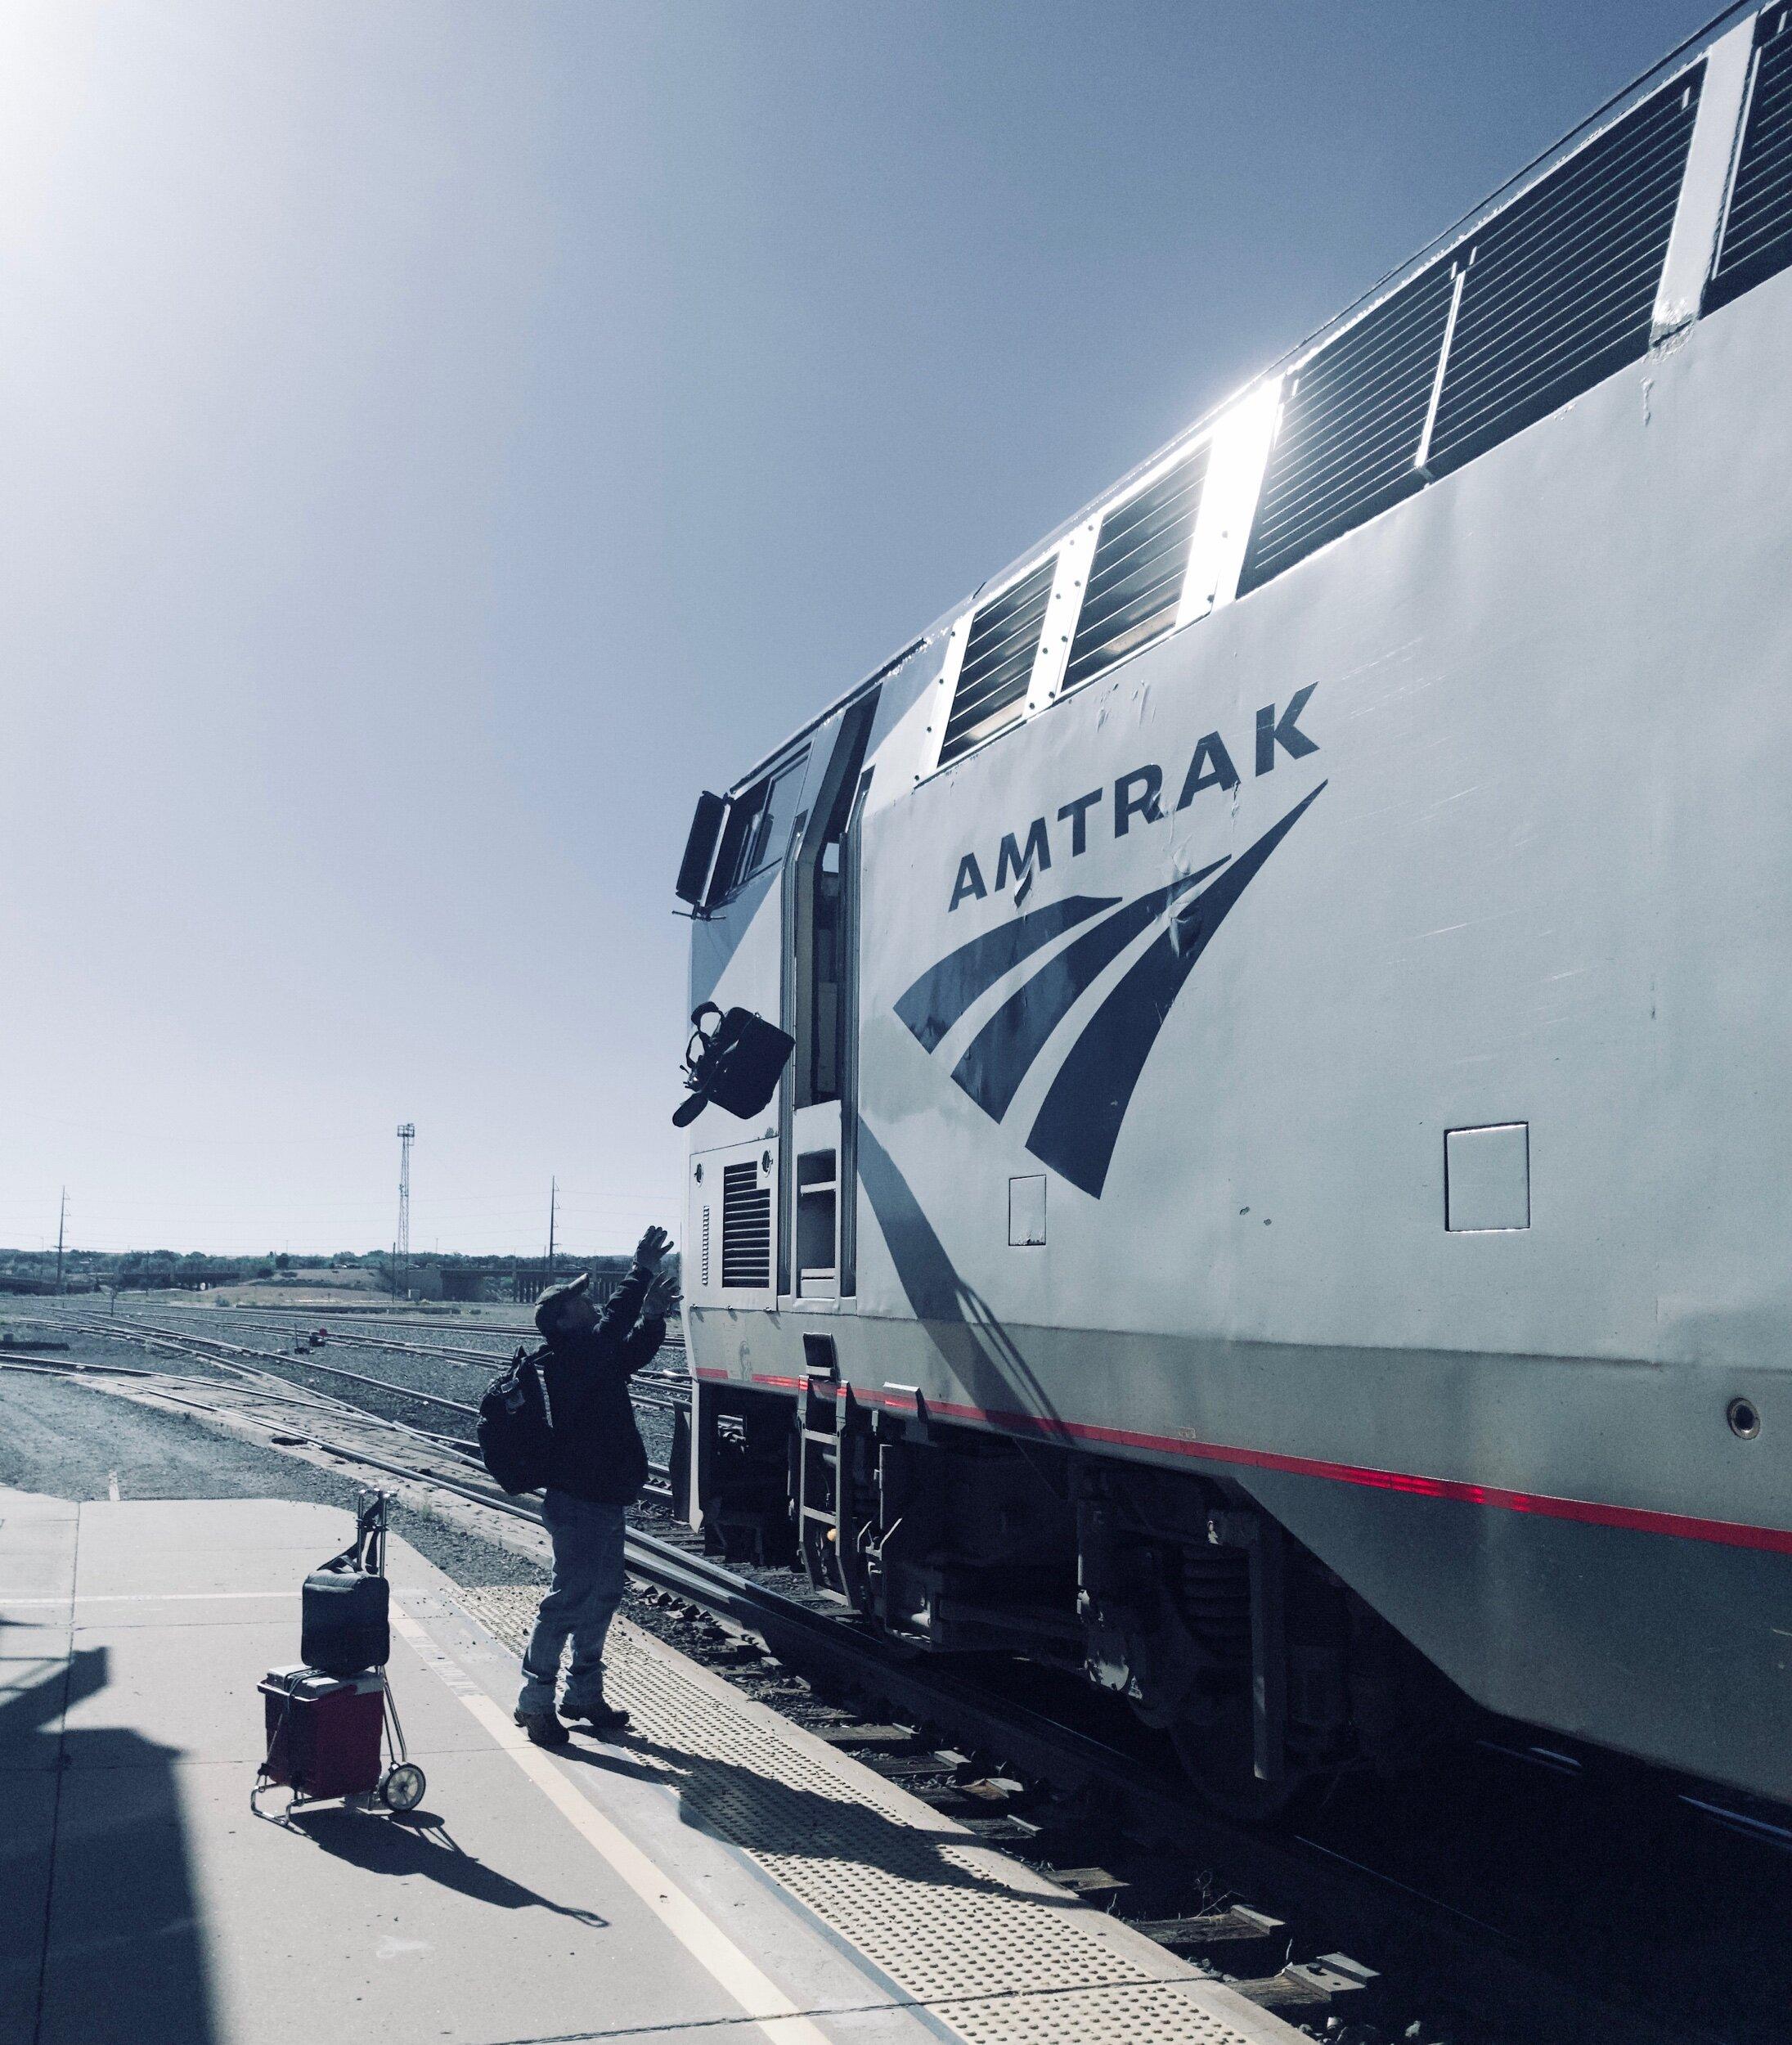 Engineer Aboard. Grand Junction, Colorado. September 2019. © William D. Walker